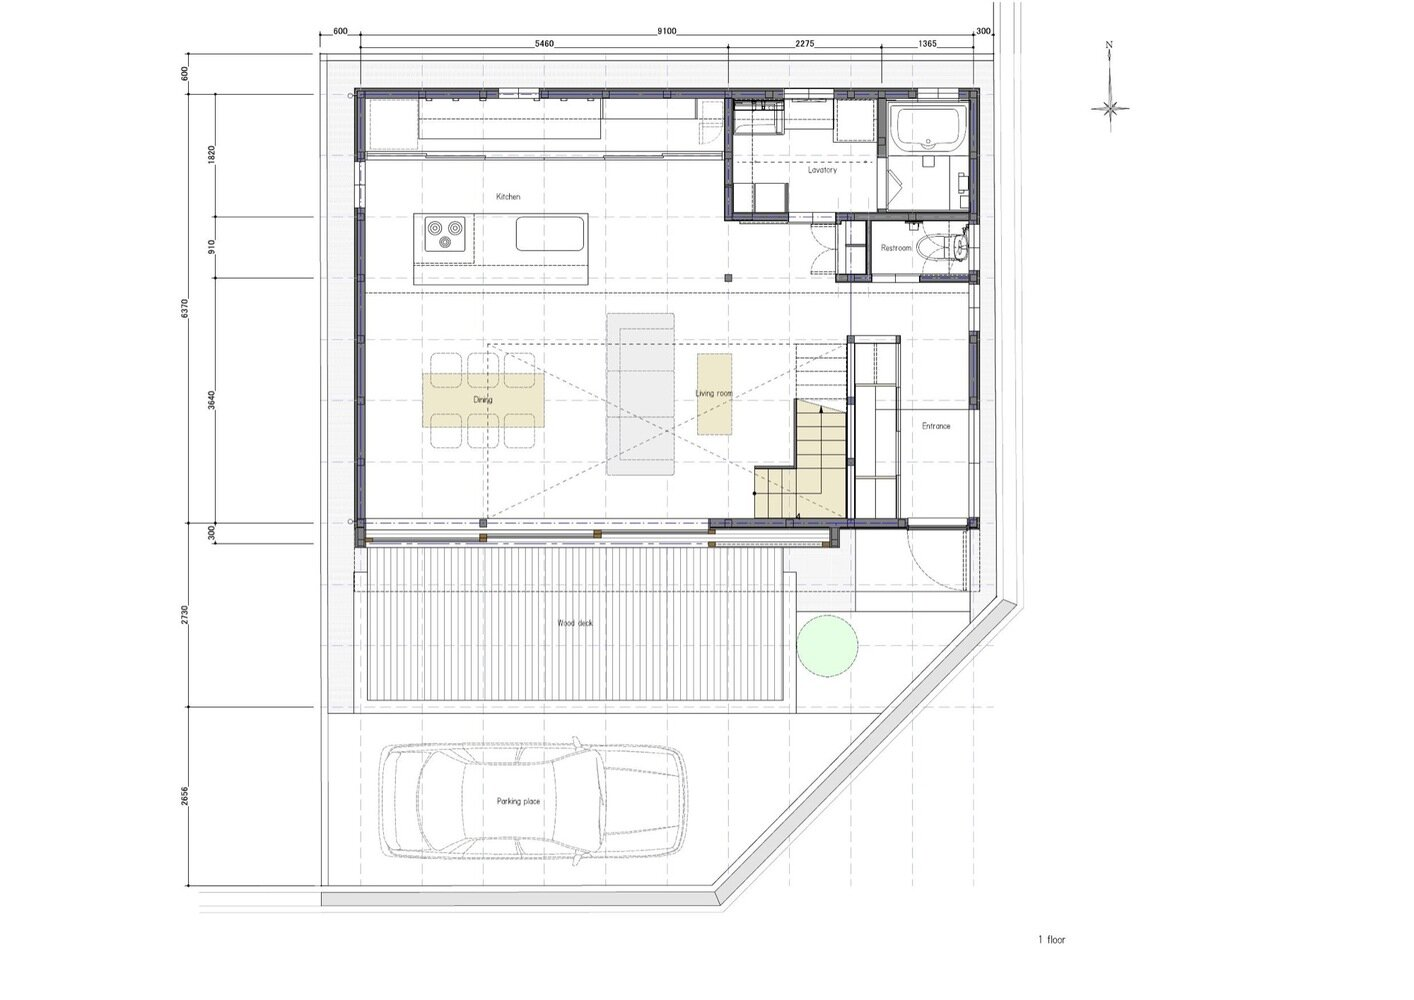 S-House - Coil Kazuteru Matumura Architects - Japan - Floor Plan 1 - Humble Homes